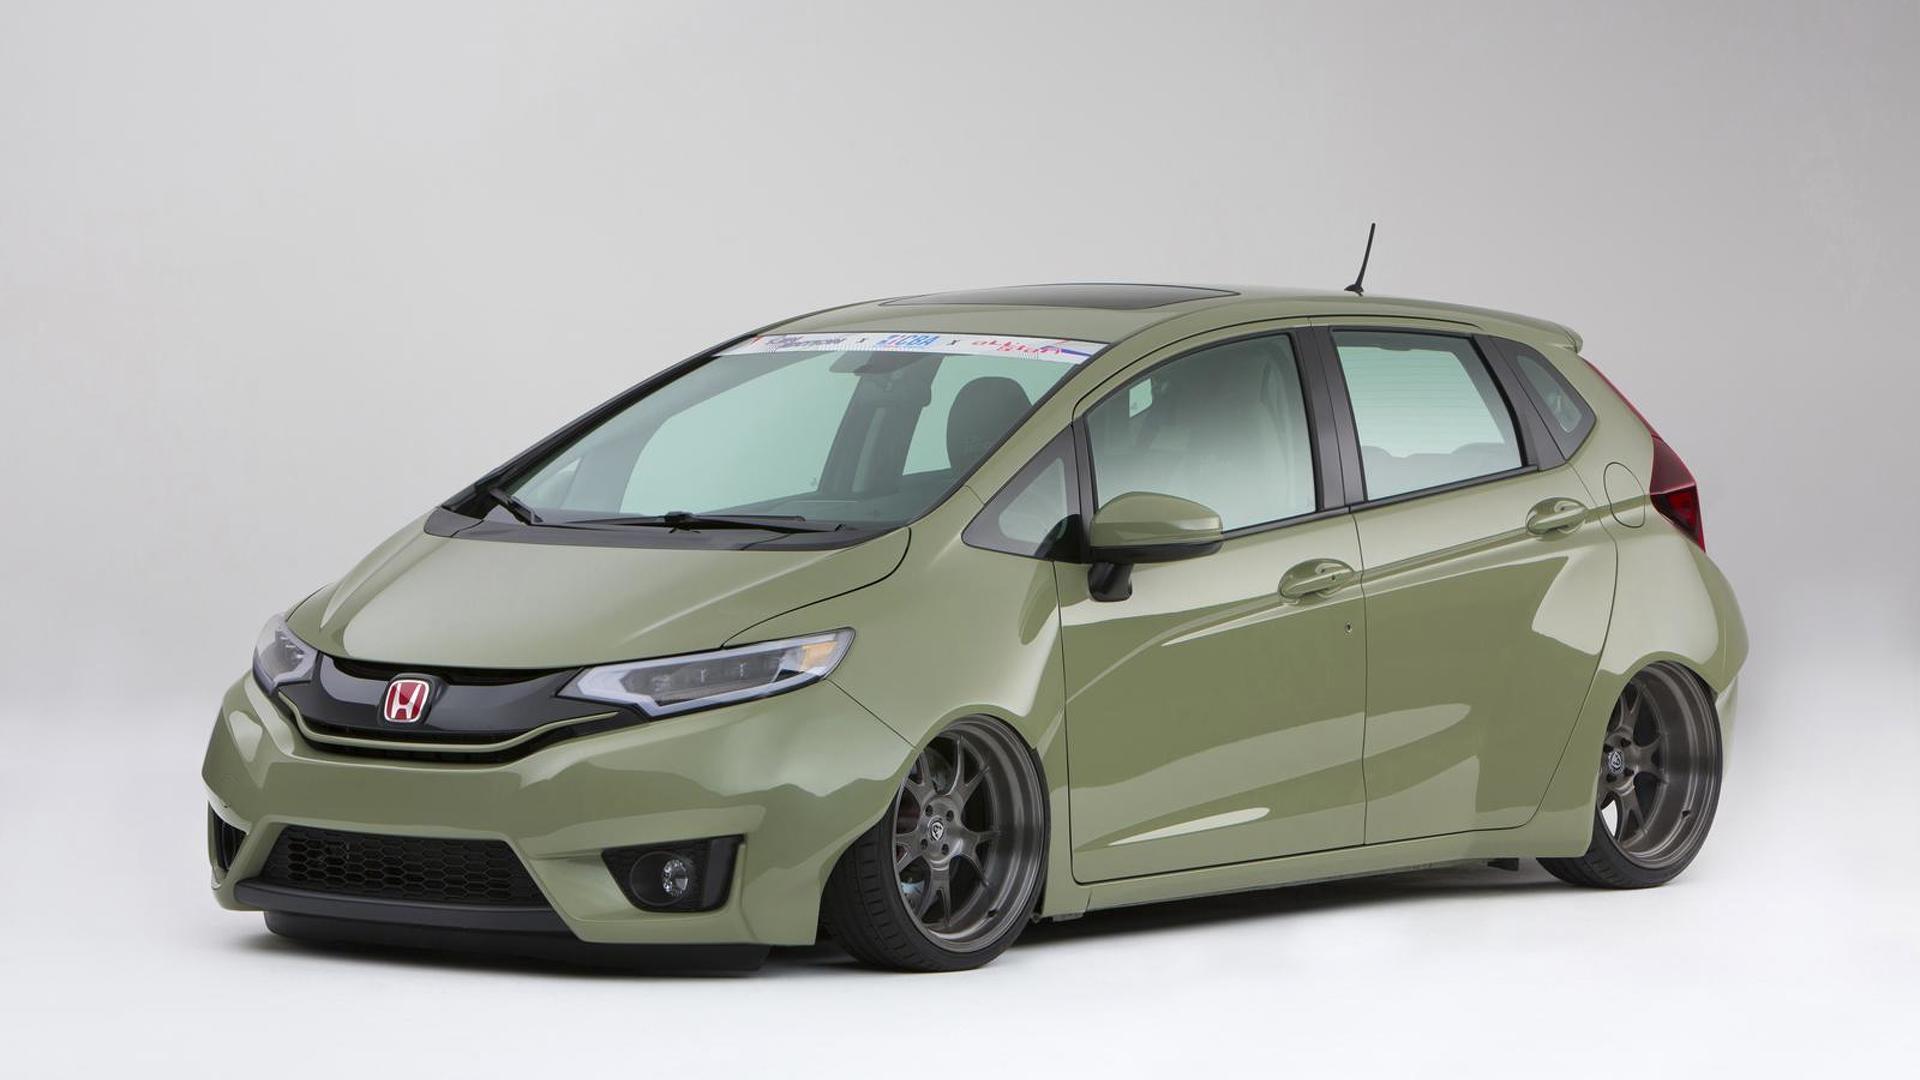 Honda introduces nine customized 2015 Fit versions at SEMA